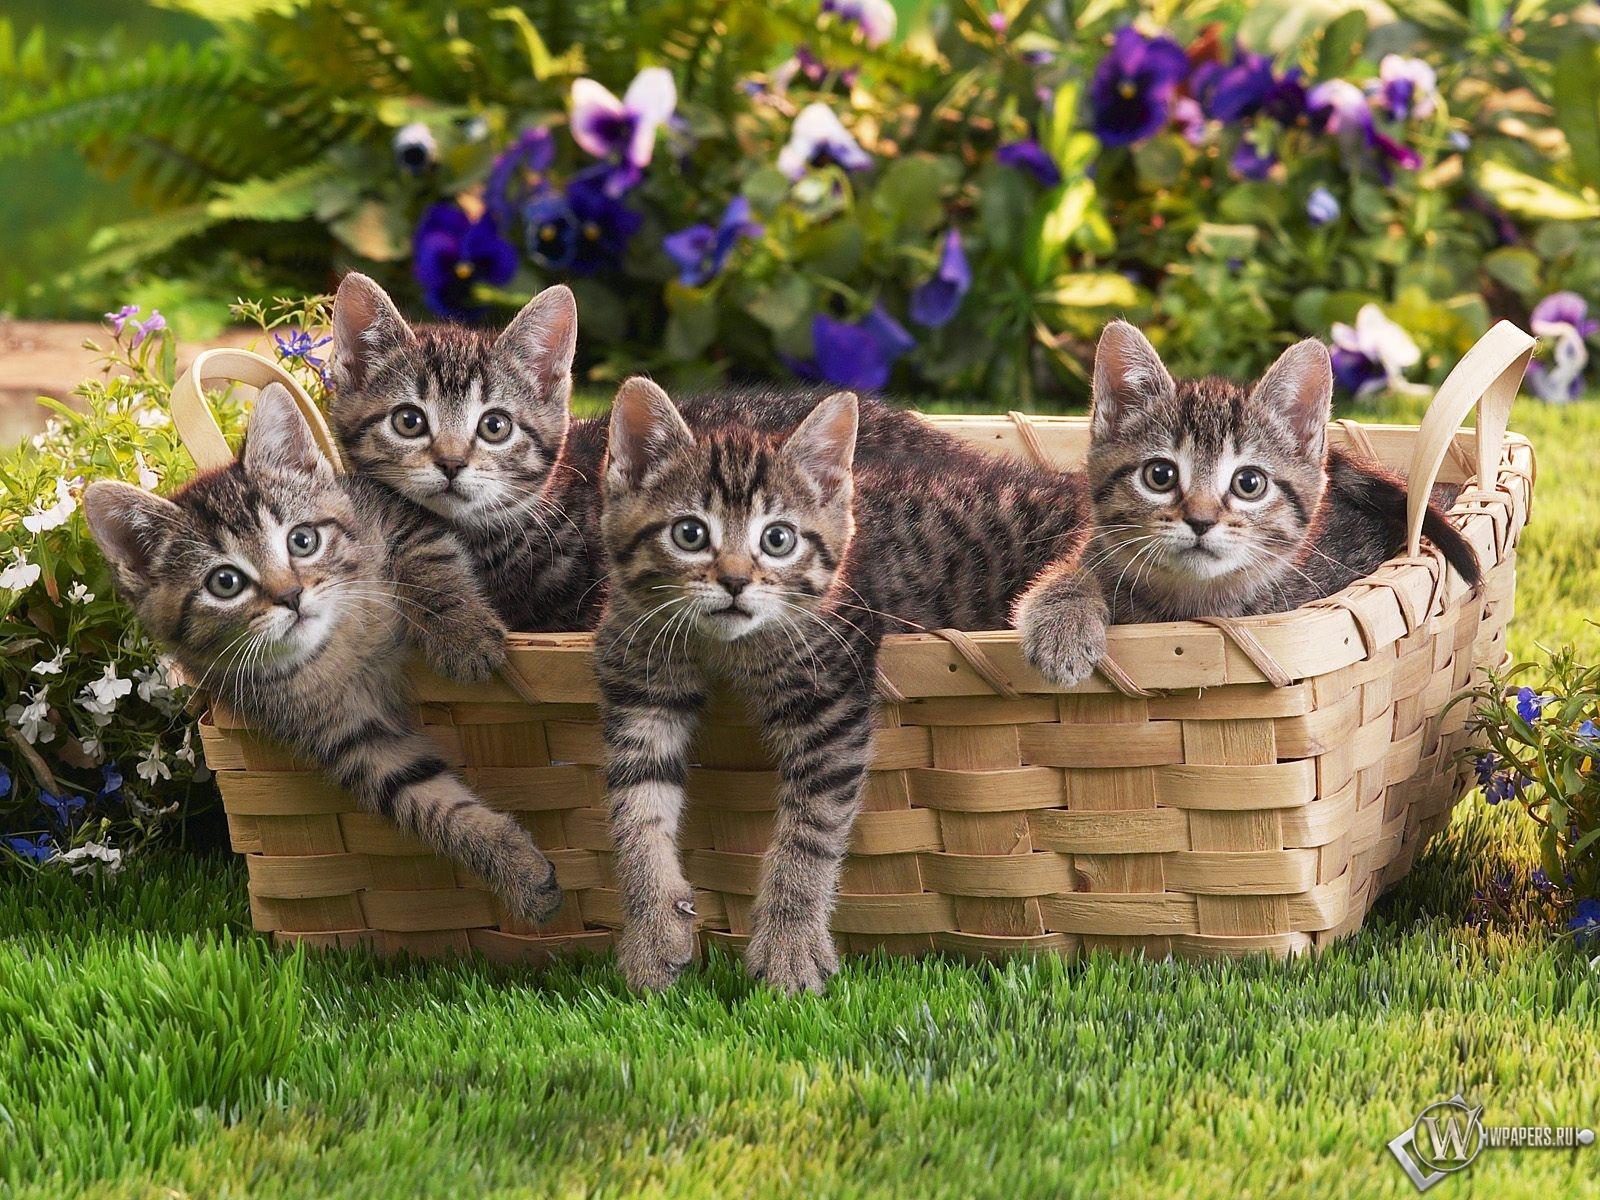 Котята в корзинке 1600x1200